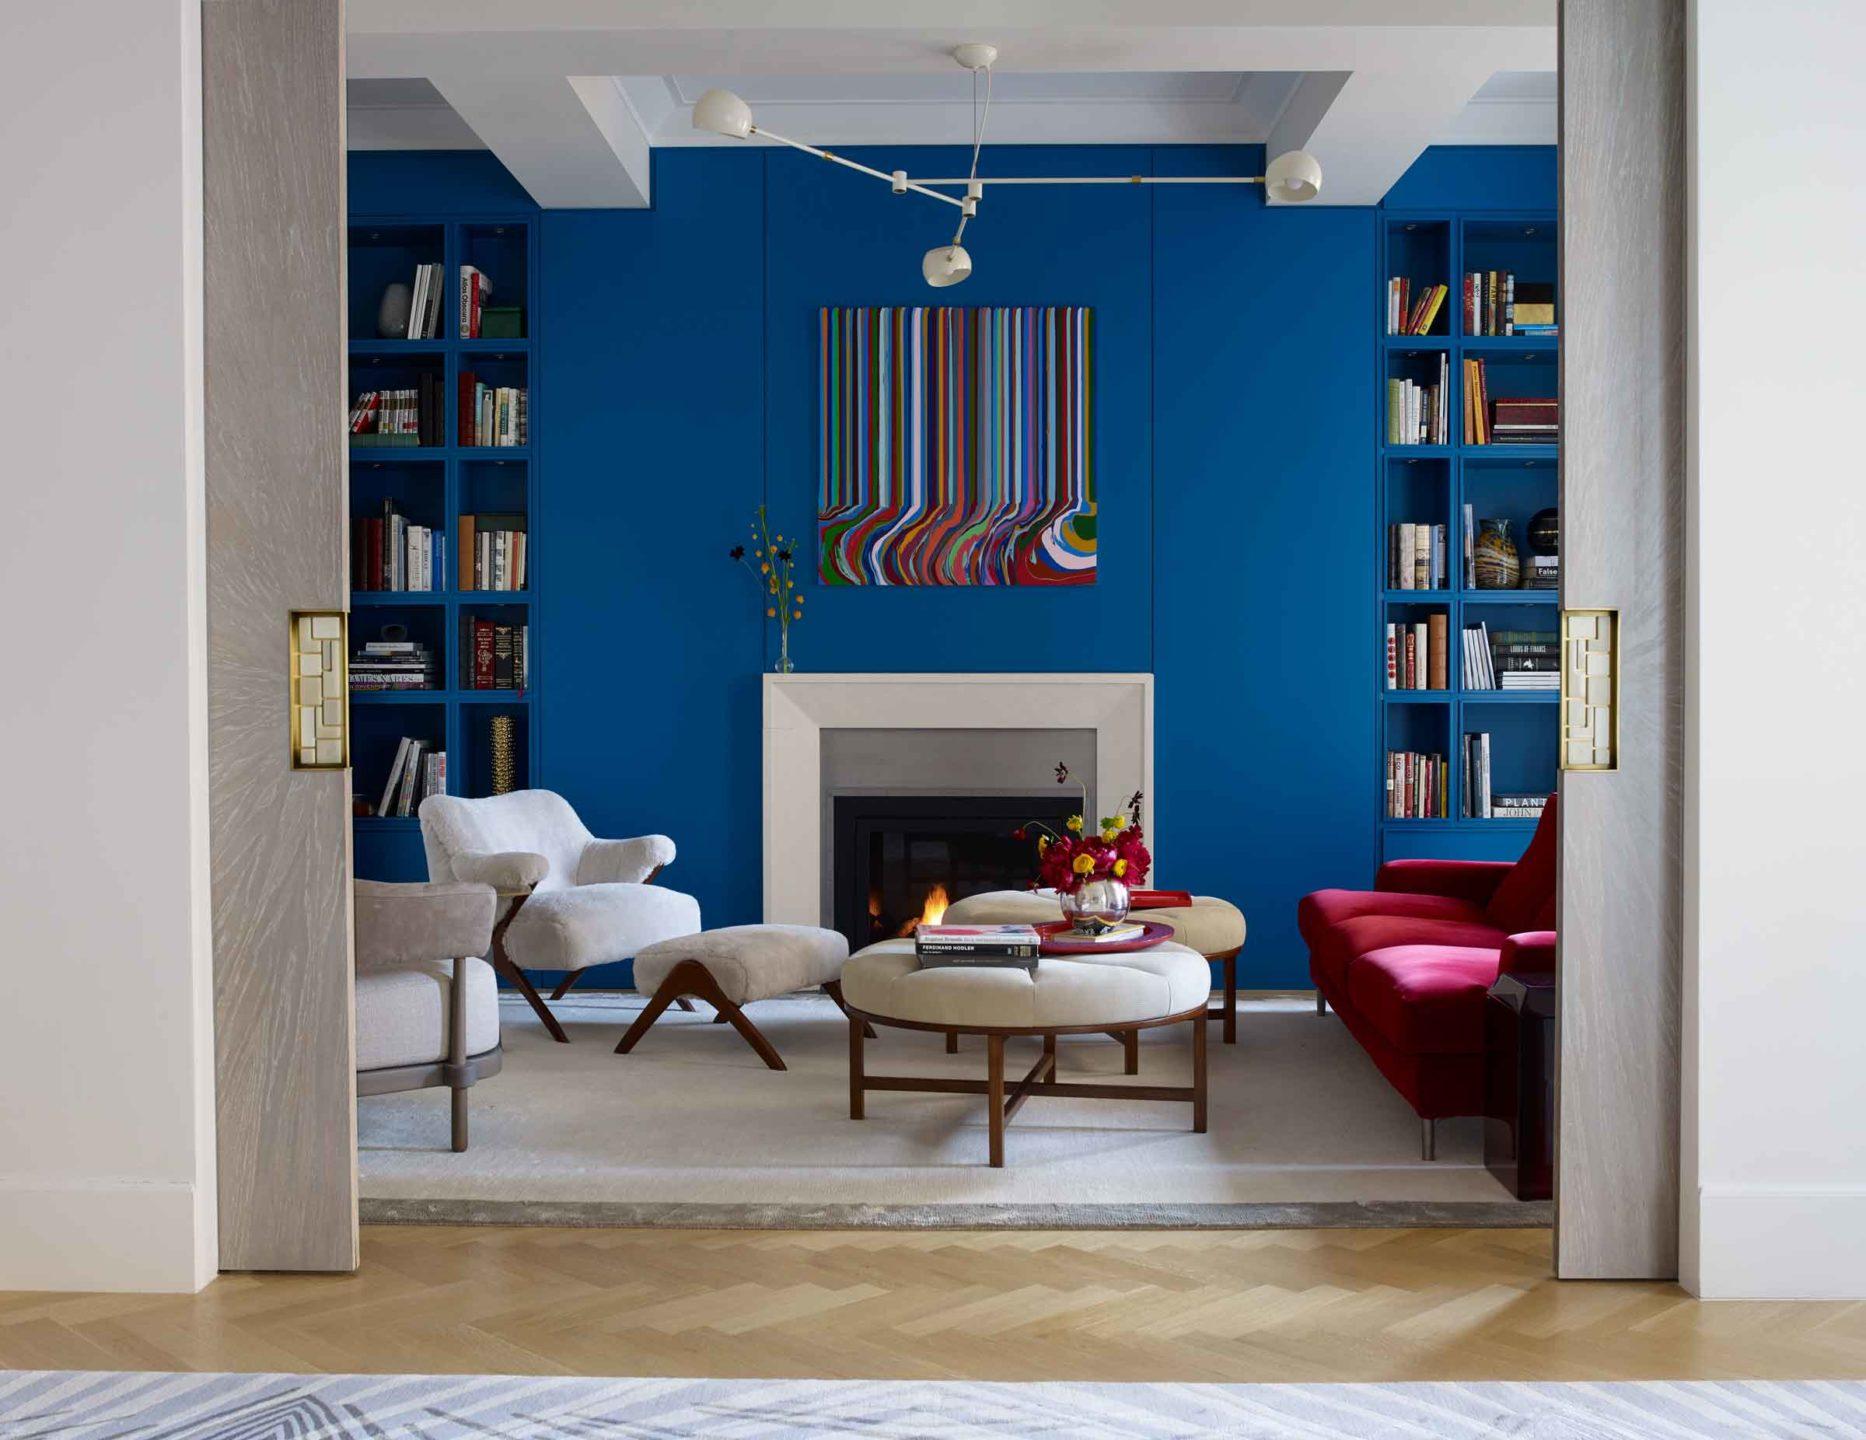 Nicole-Fuller-greenwich-village-living-room-new-york-interior-designer-8